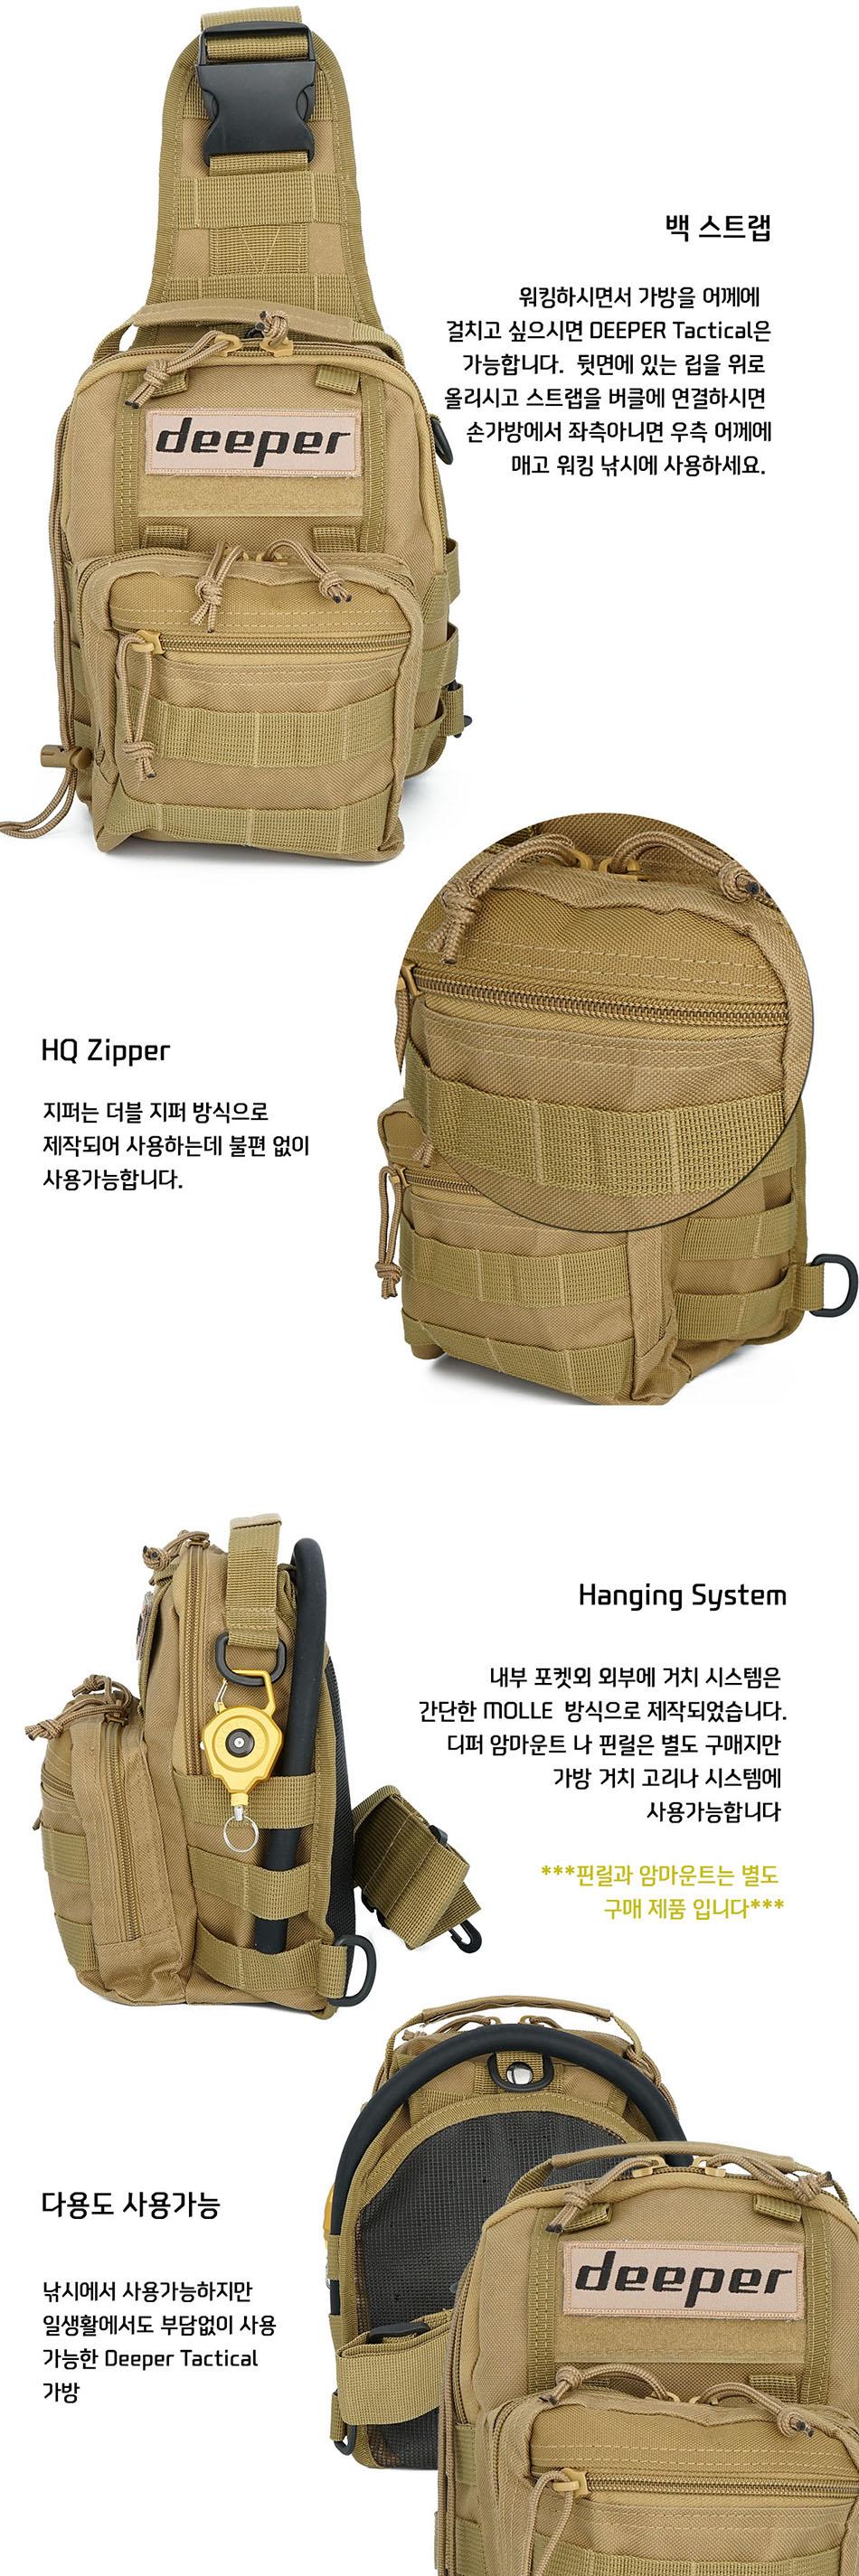 tactical2.jpg